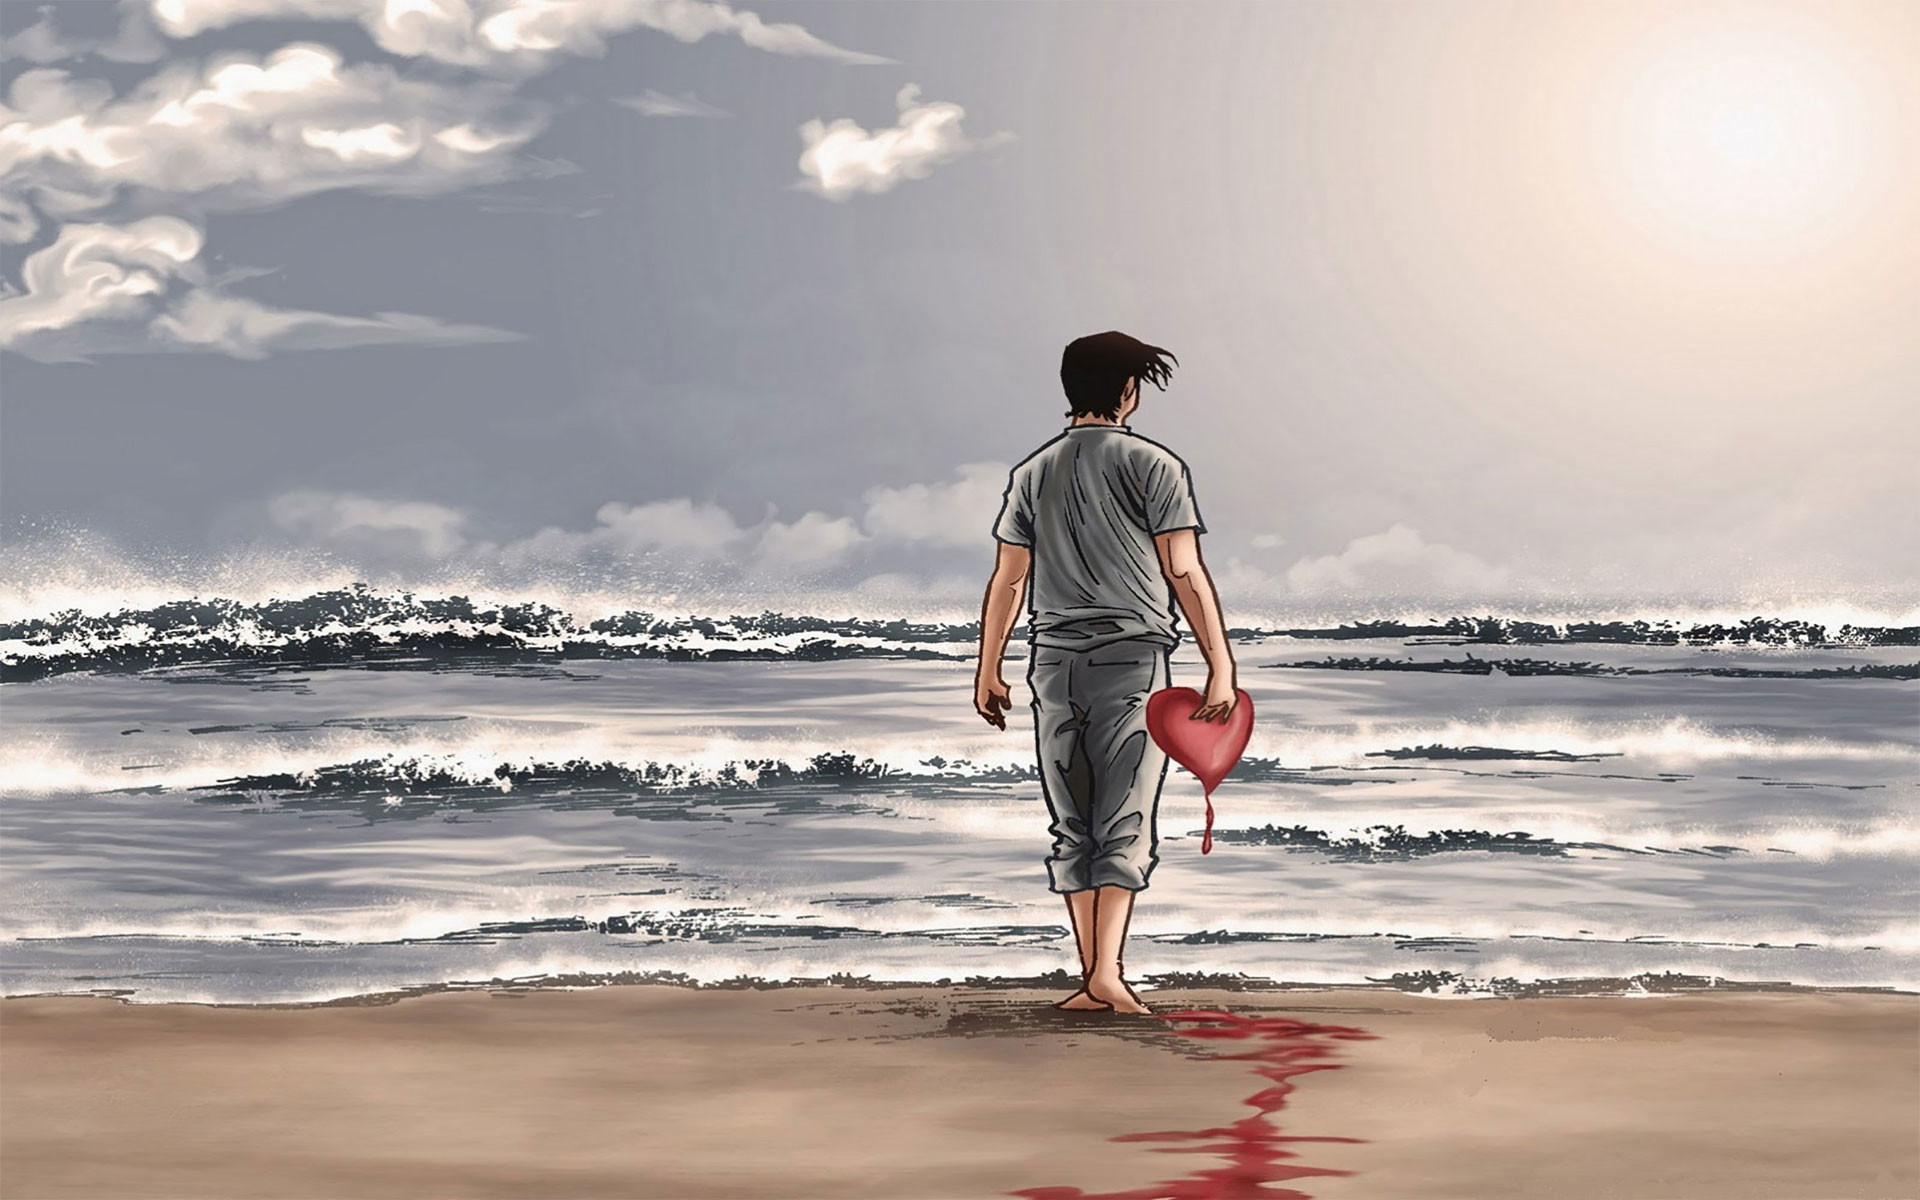 Broken heart bleeds tears quotes wallpaper 00764 baltana.